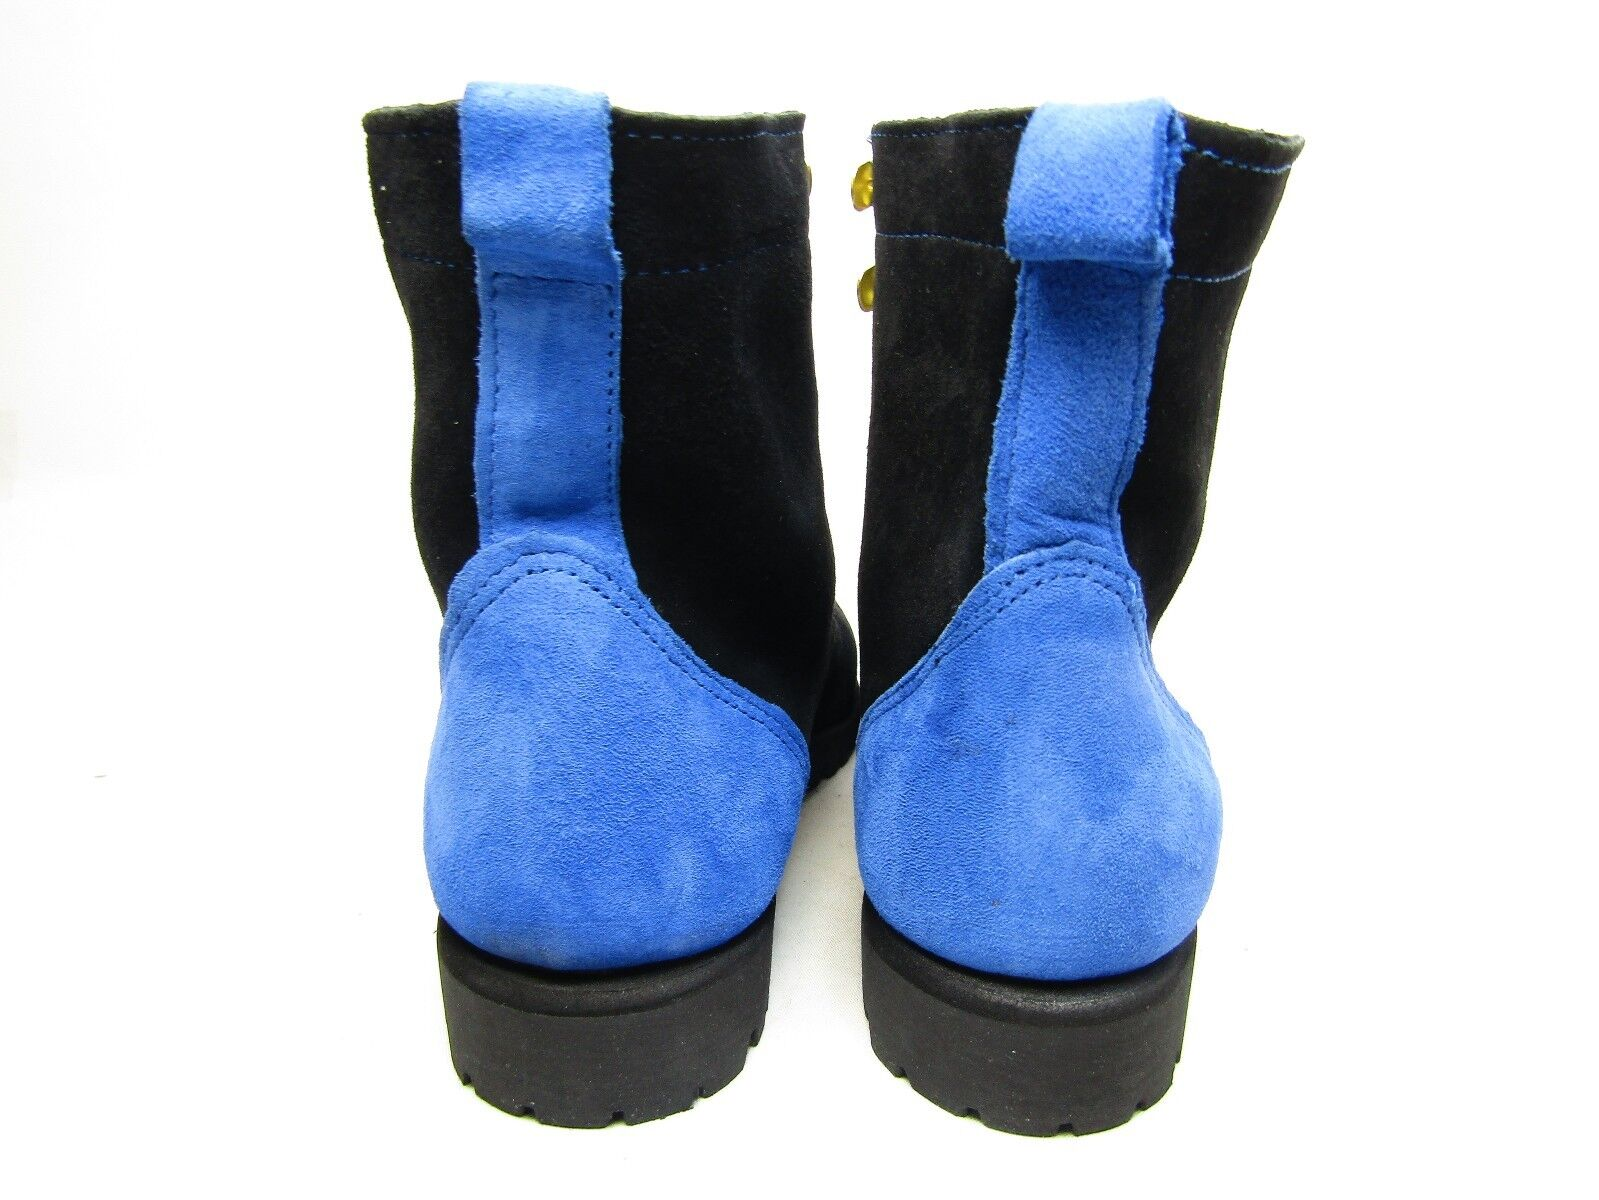 Sebago Womens Astoria B50128 Slip Resistant Ankle Boot shoes Black Black Black Royal Size 8M c82daa